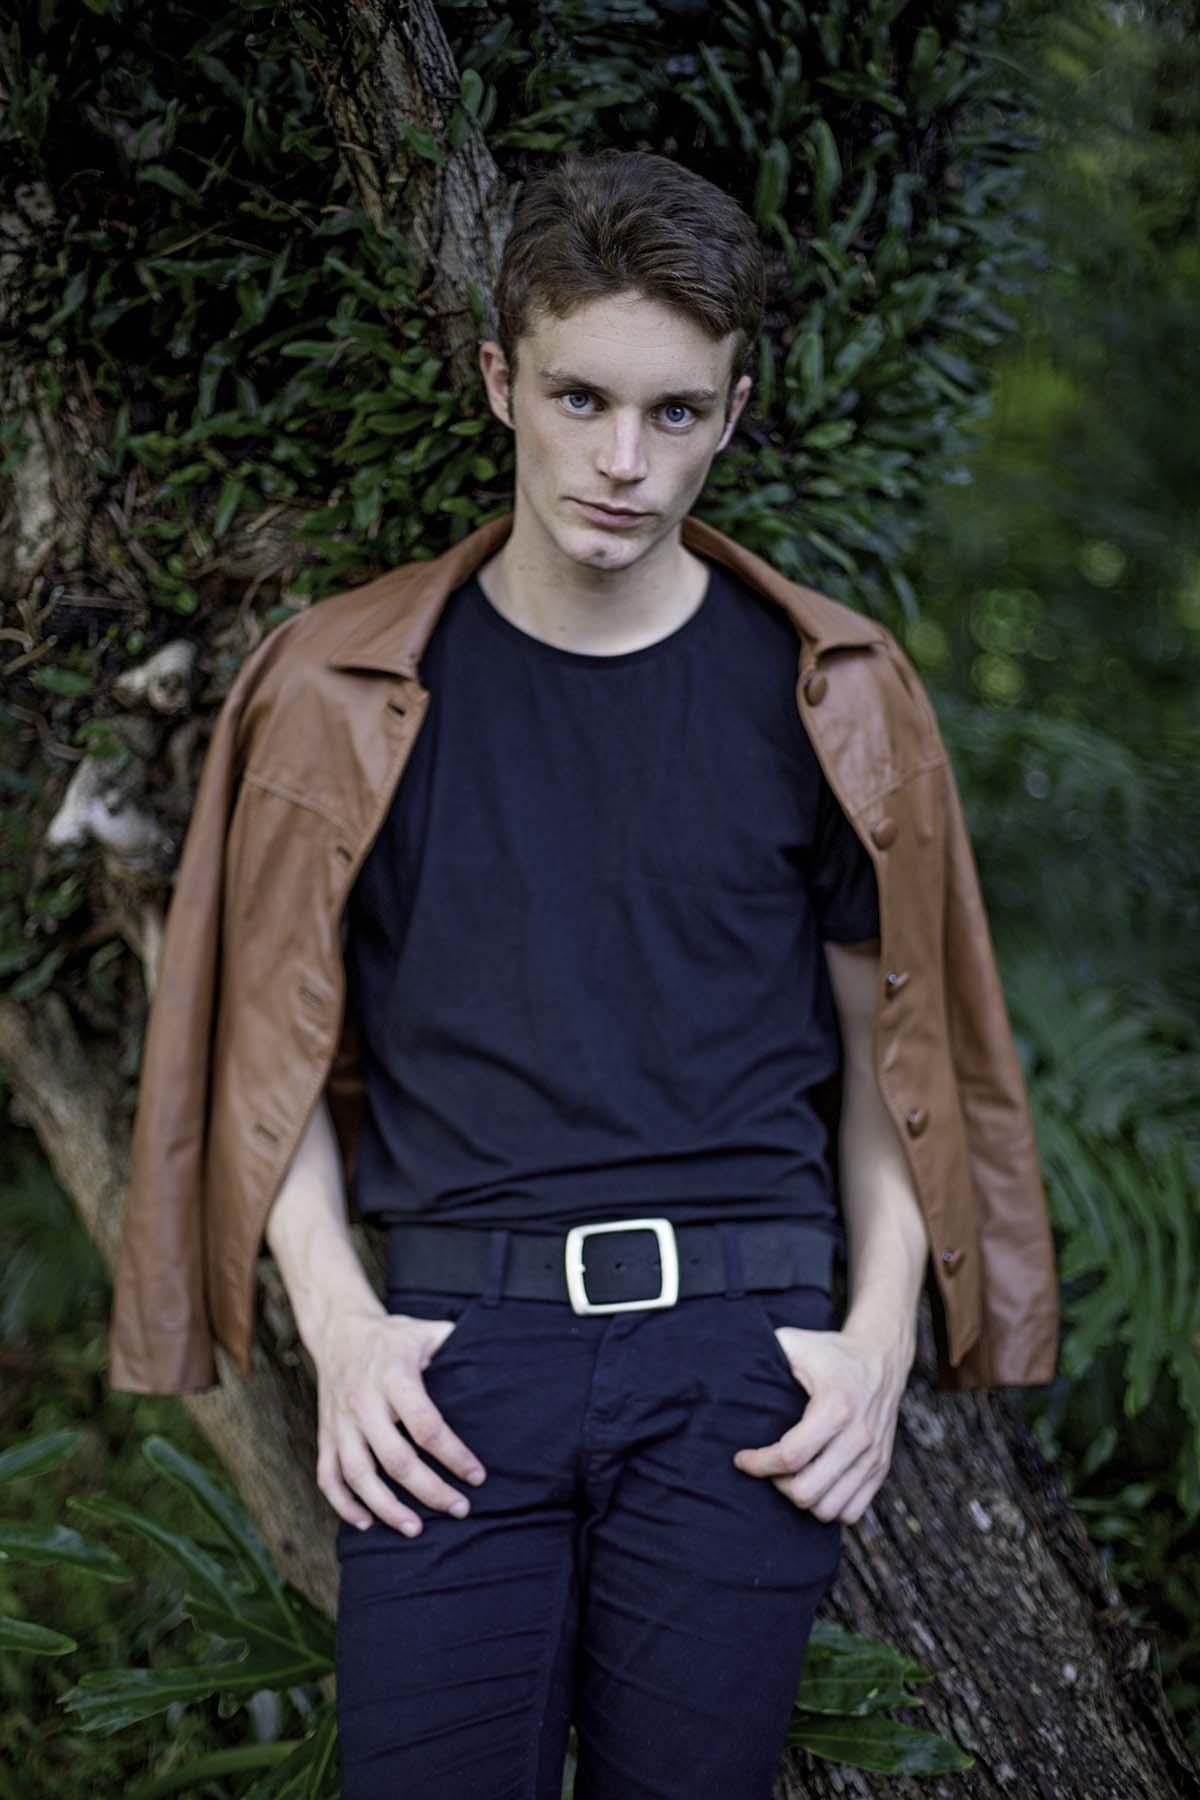 Matheus Plentz by Ronaldo Gutierrez for Brazilian Male Model